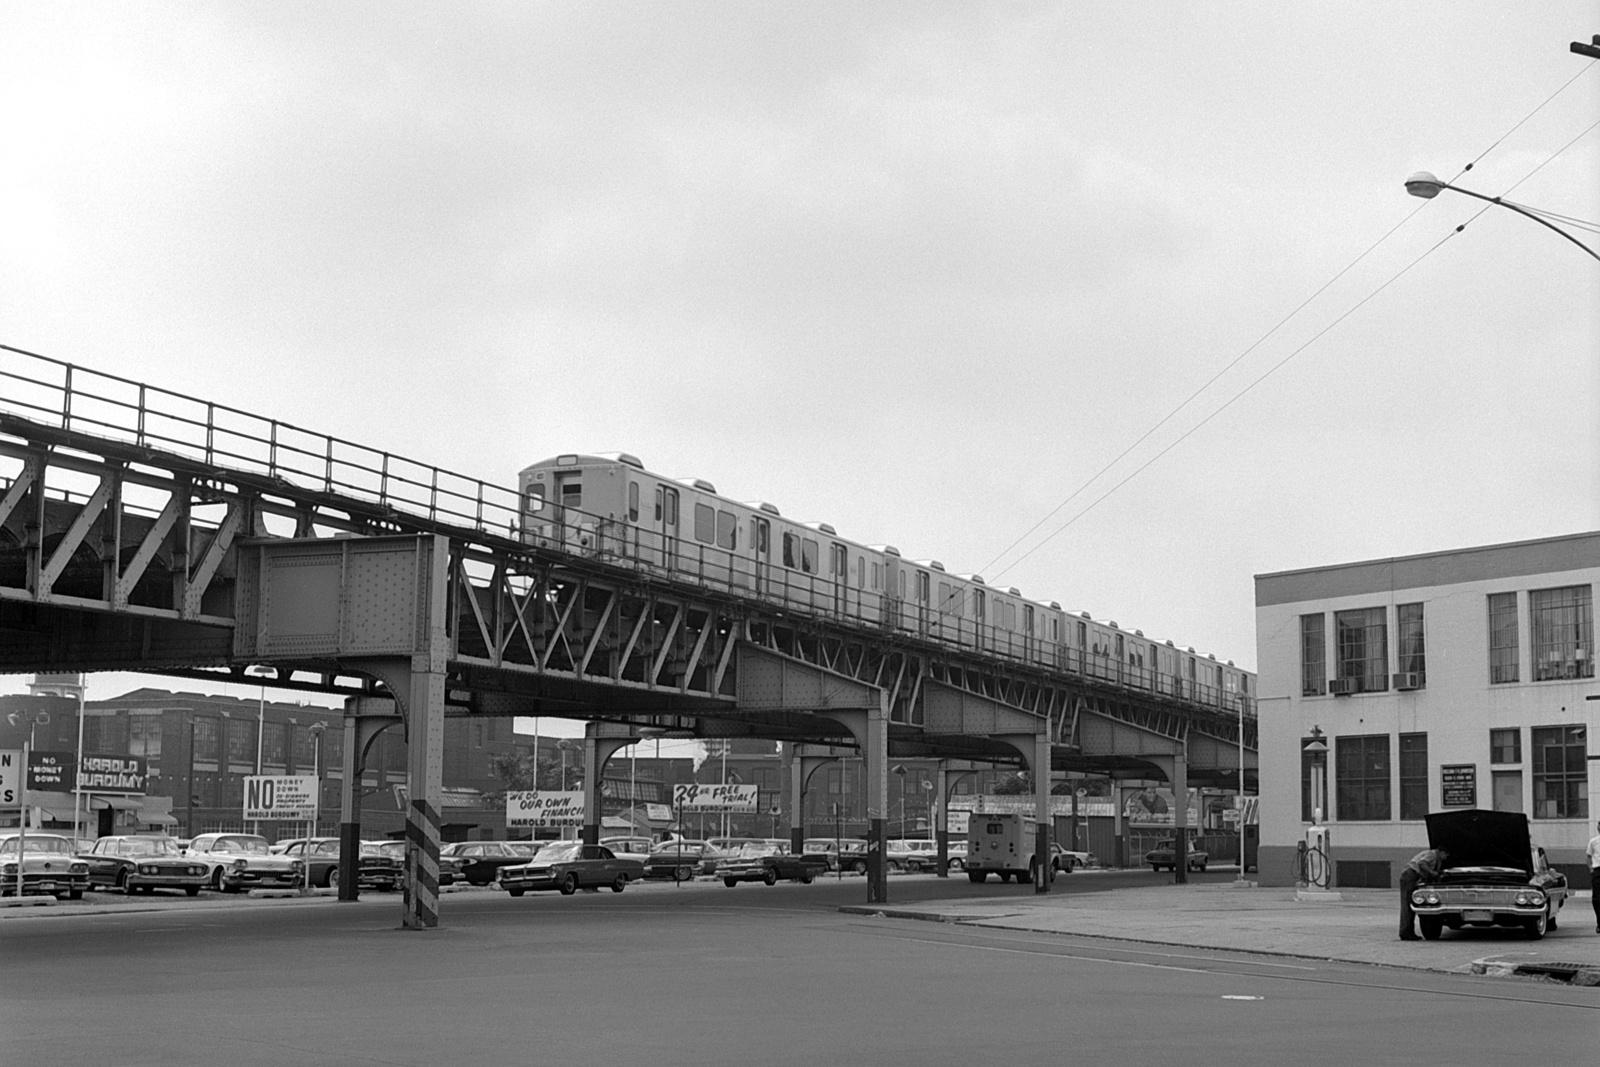 (514k, 1600x1067)<br><b>Country:</b> United States<br><b>City:</b> Philadelphia, PA<br><b>System:</b> SEPTA (or Predecessor)<br><b>Line:</b> Market-Frankford El<br><b>Location:</b> Erie-Torresdale<br><b>Car:</b> SEPTA M-3 (Budd, 1960)  <br><b>Collection of:</b> David Pirmann<br><b>Date:</b> 8/29/1964<br><b>Viewed (this week/total):</b> 3 / 107